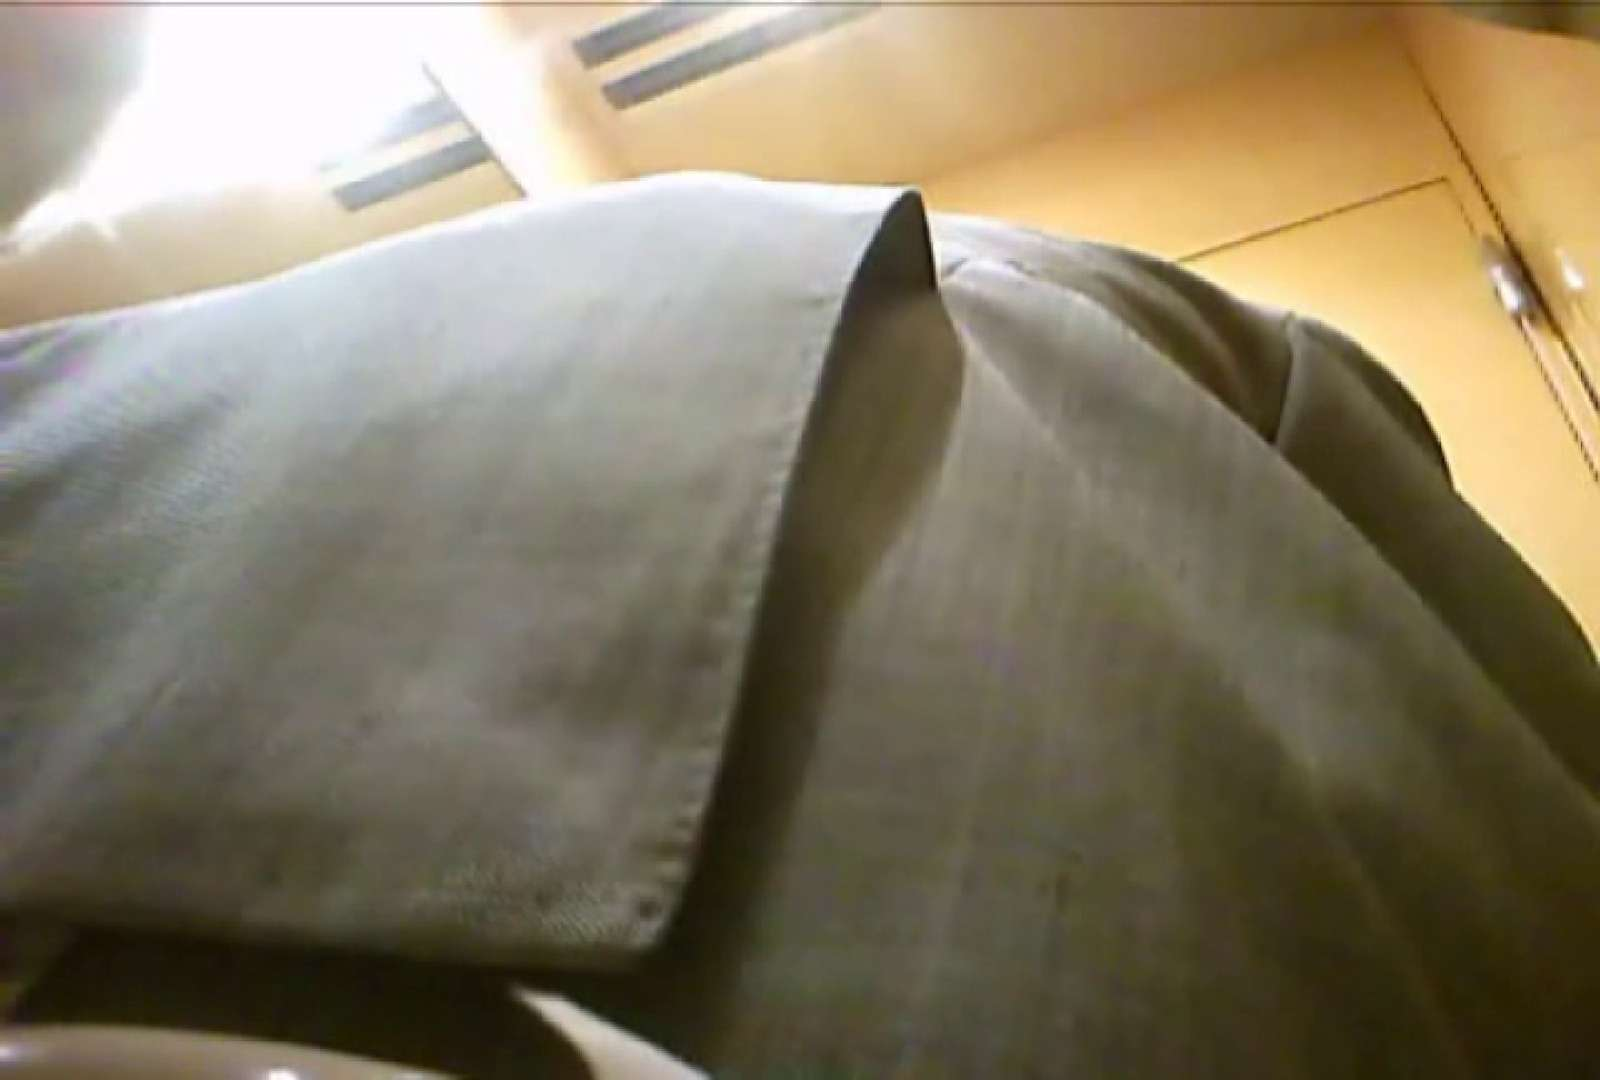 SEASON 2ND!掴み取りさんの洗面所覗き!in新幹線!VOL.02 スーツボーイズ | ノンケボーイズ  82pic 21